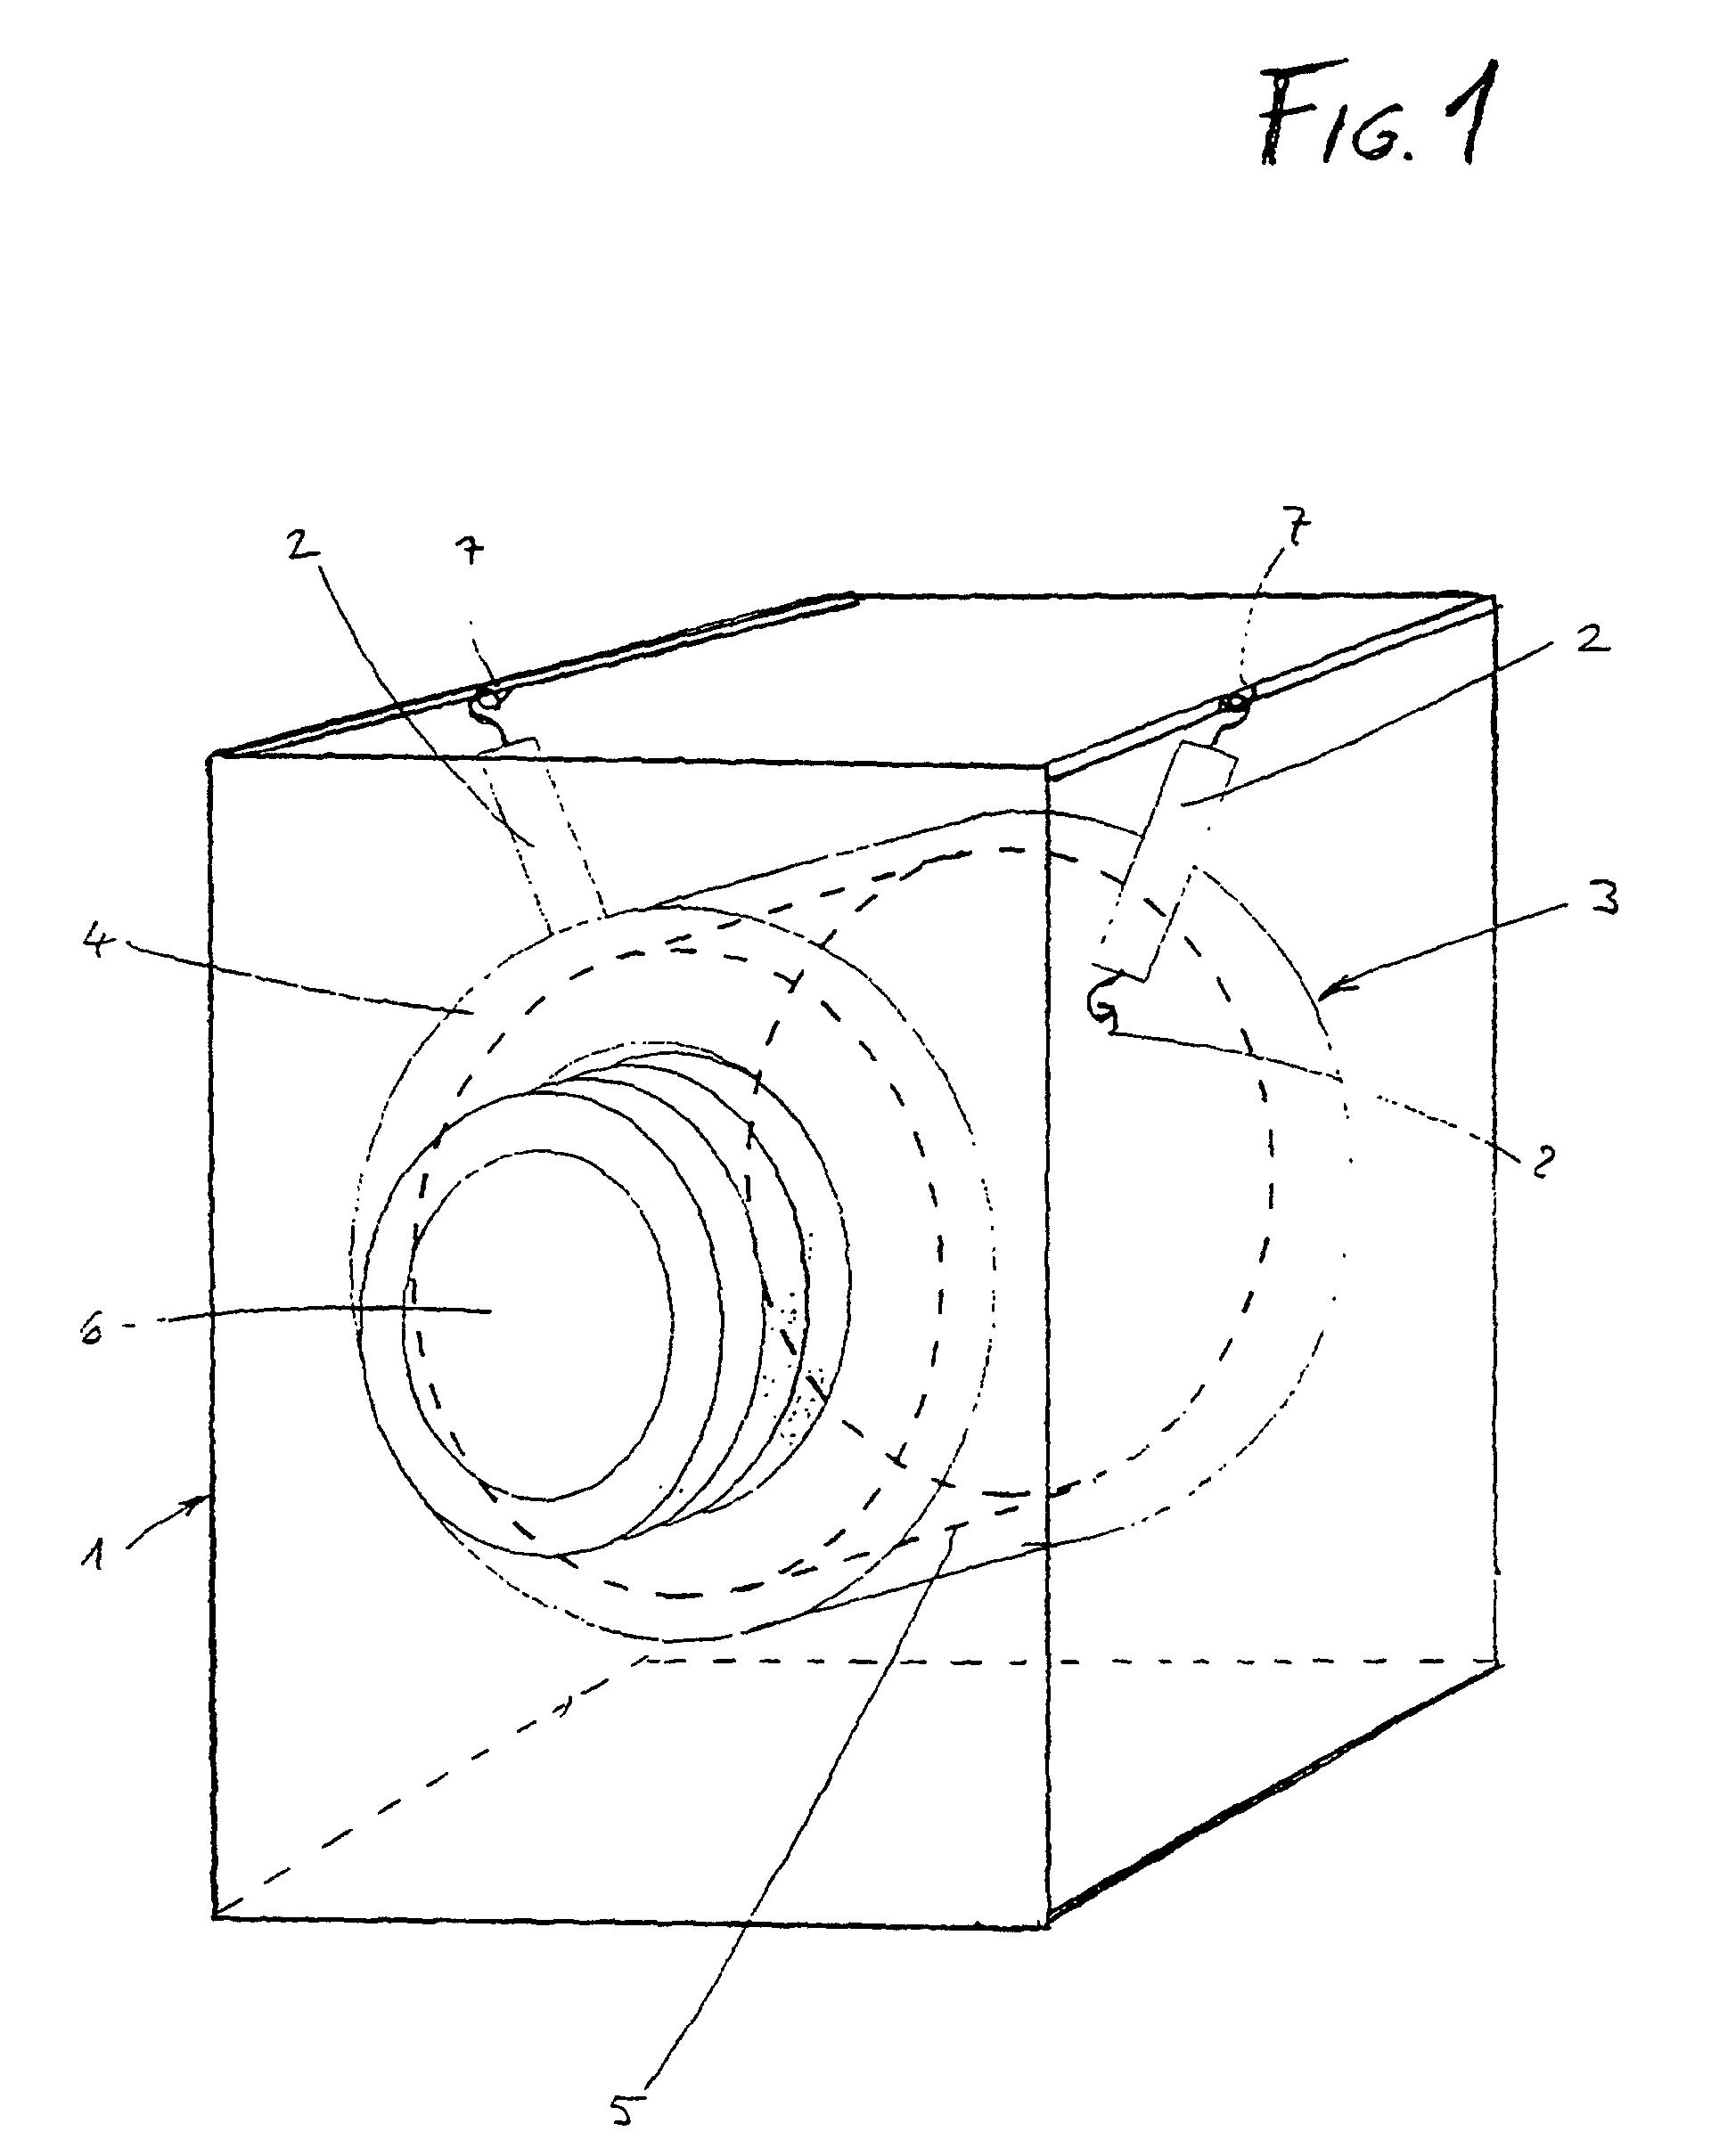 Washing Machine Drawing ~ How to draw washing machine